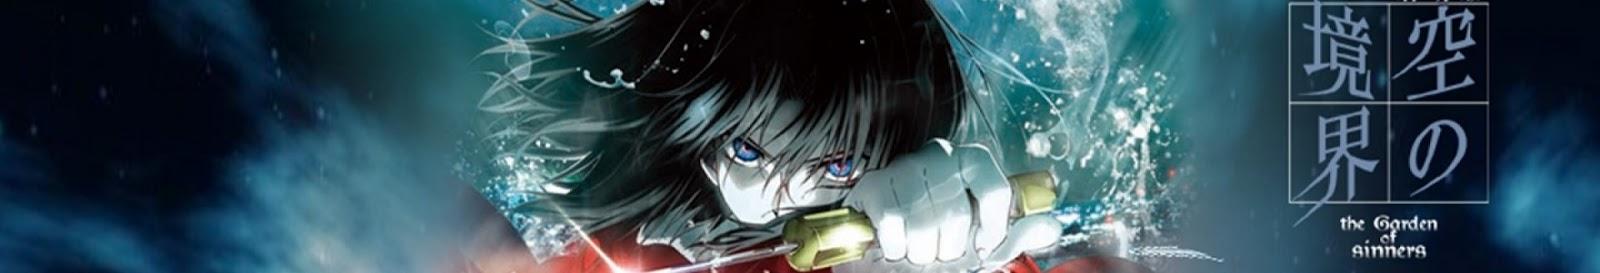 Kara No Kyoukai Garden Of Sinners Anime Review